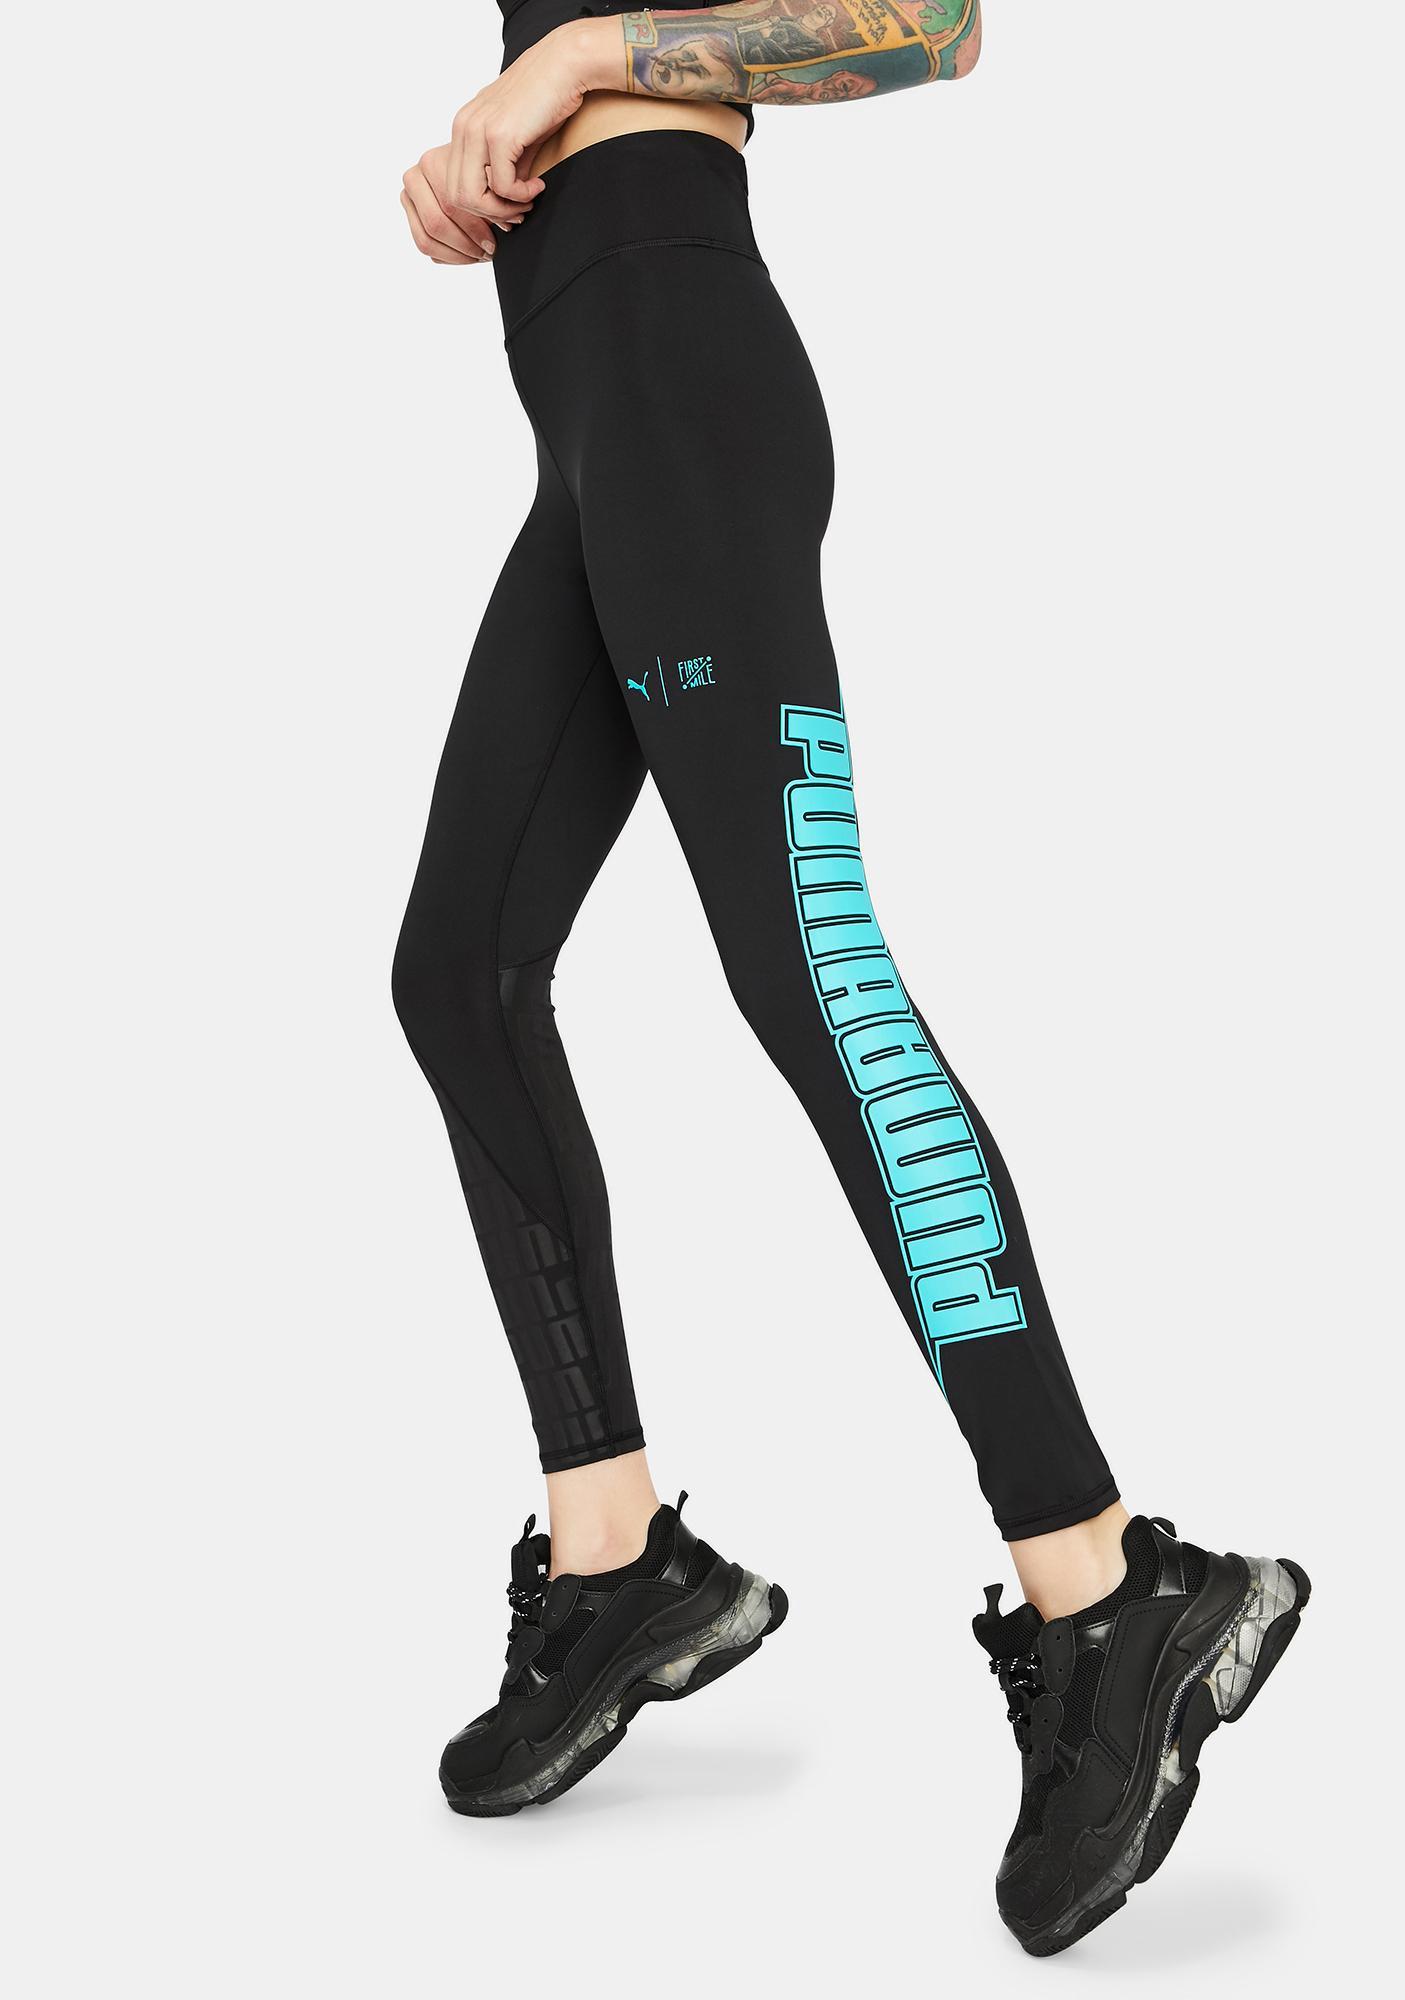 PUMA X First Mile Xtreme Women's 7/8 Training Leggings